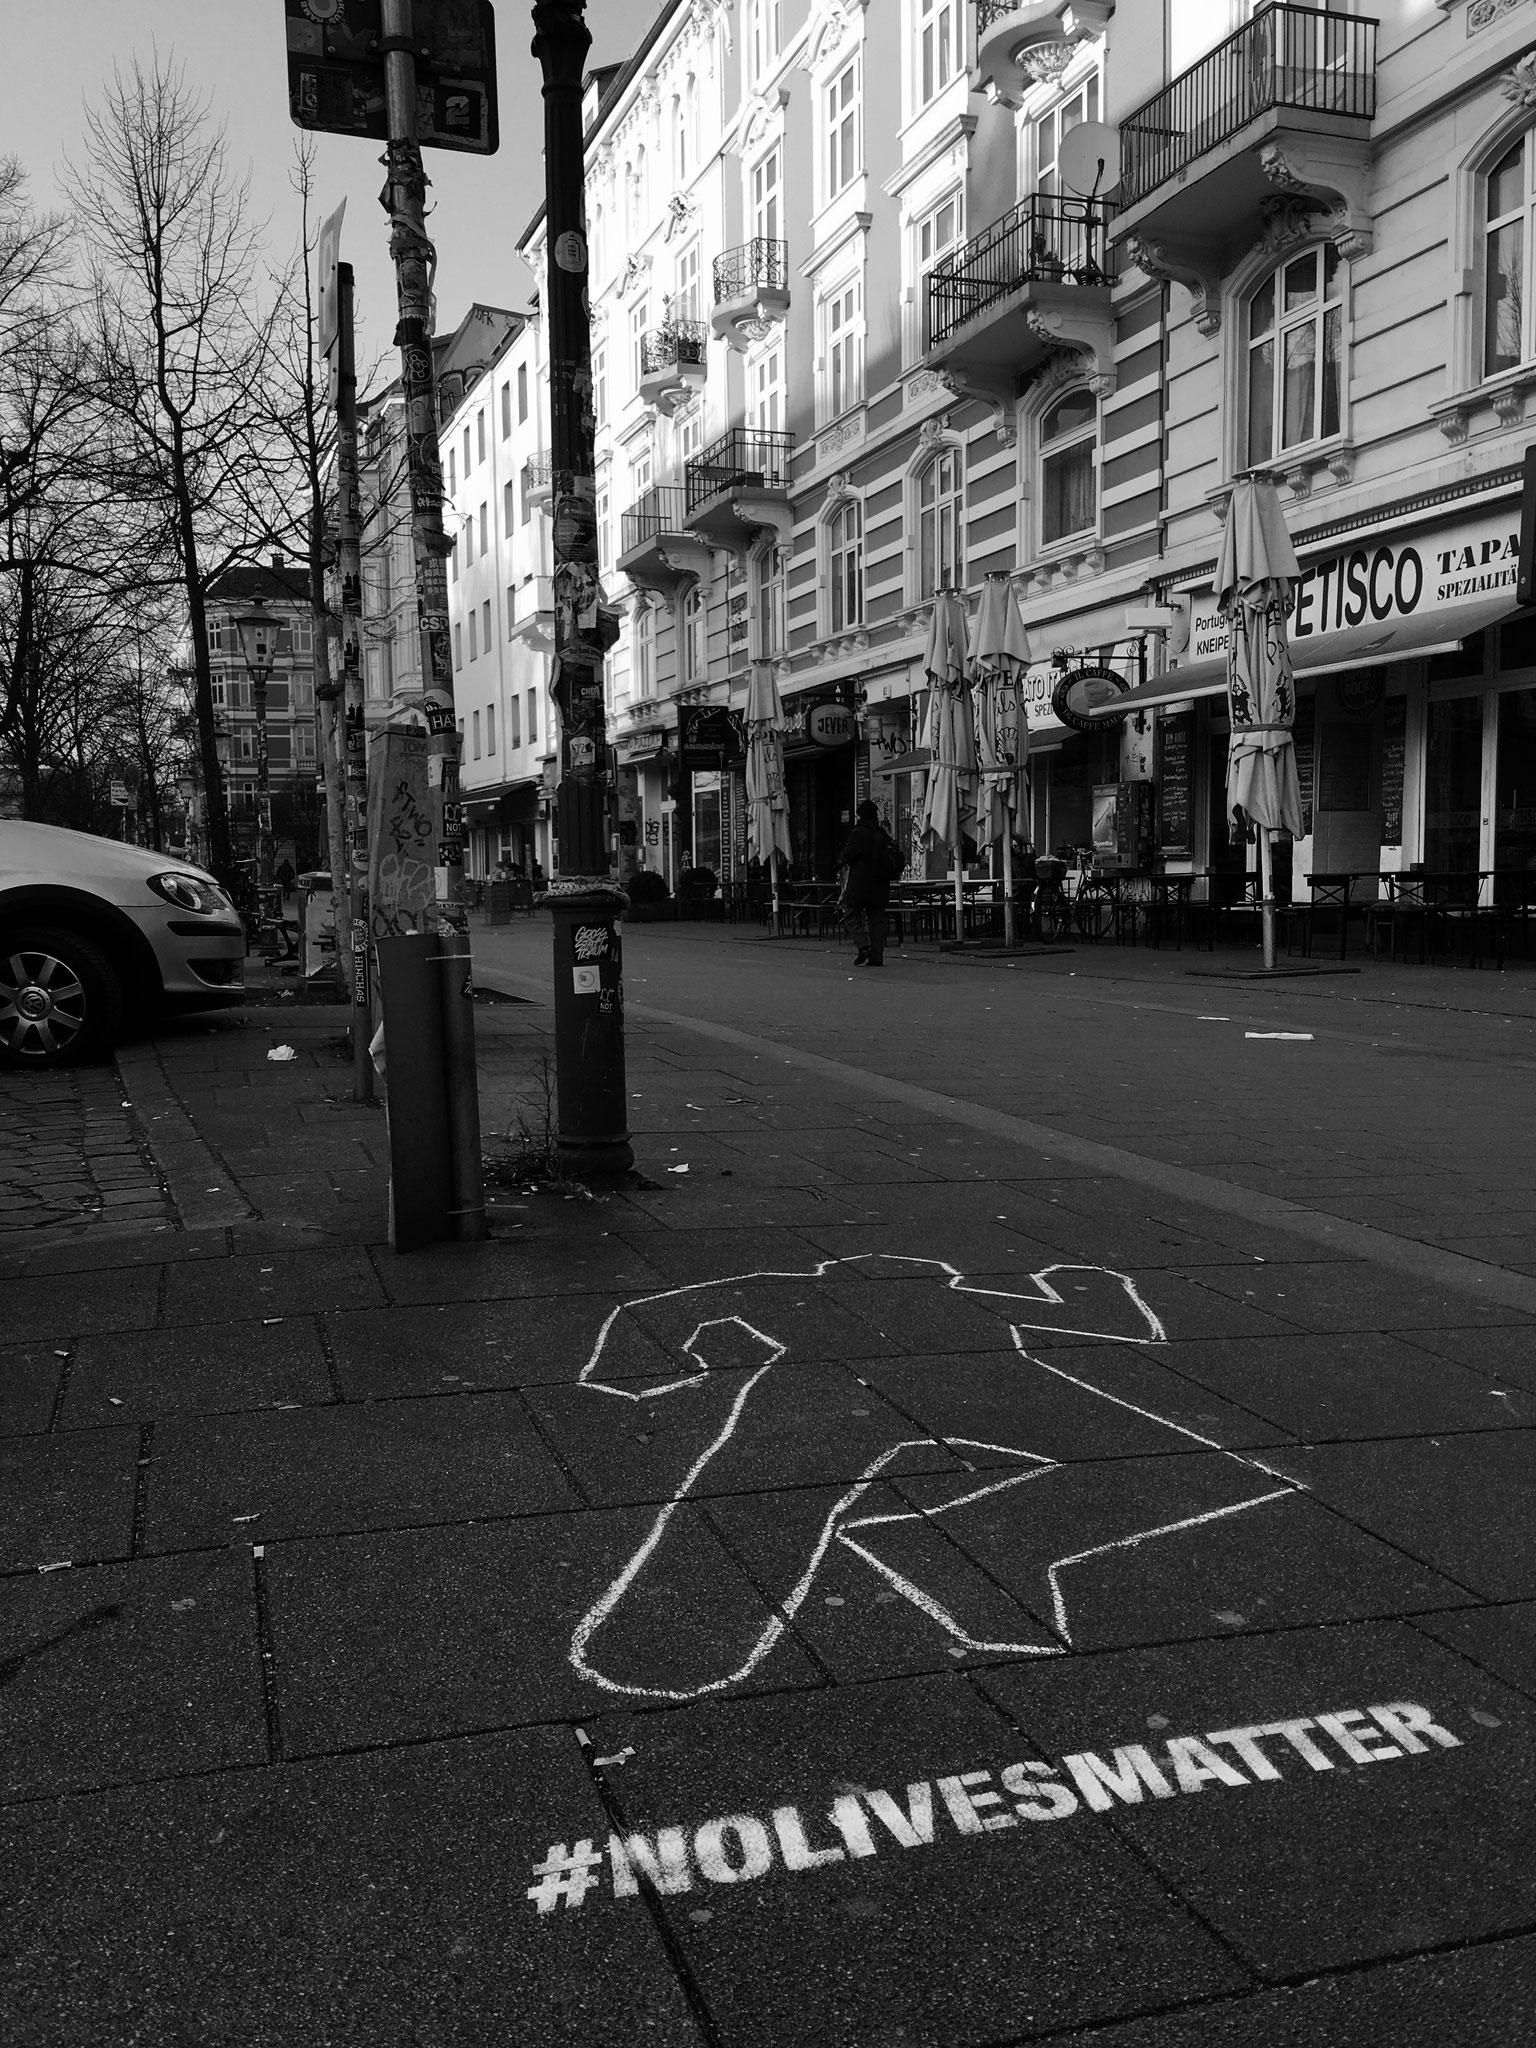 Straßenjunge - Body Count